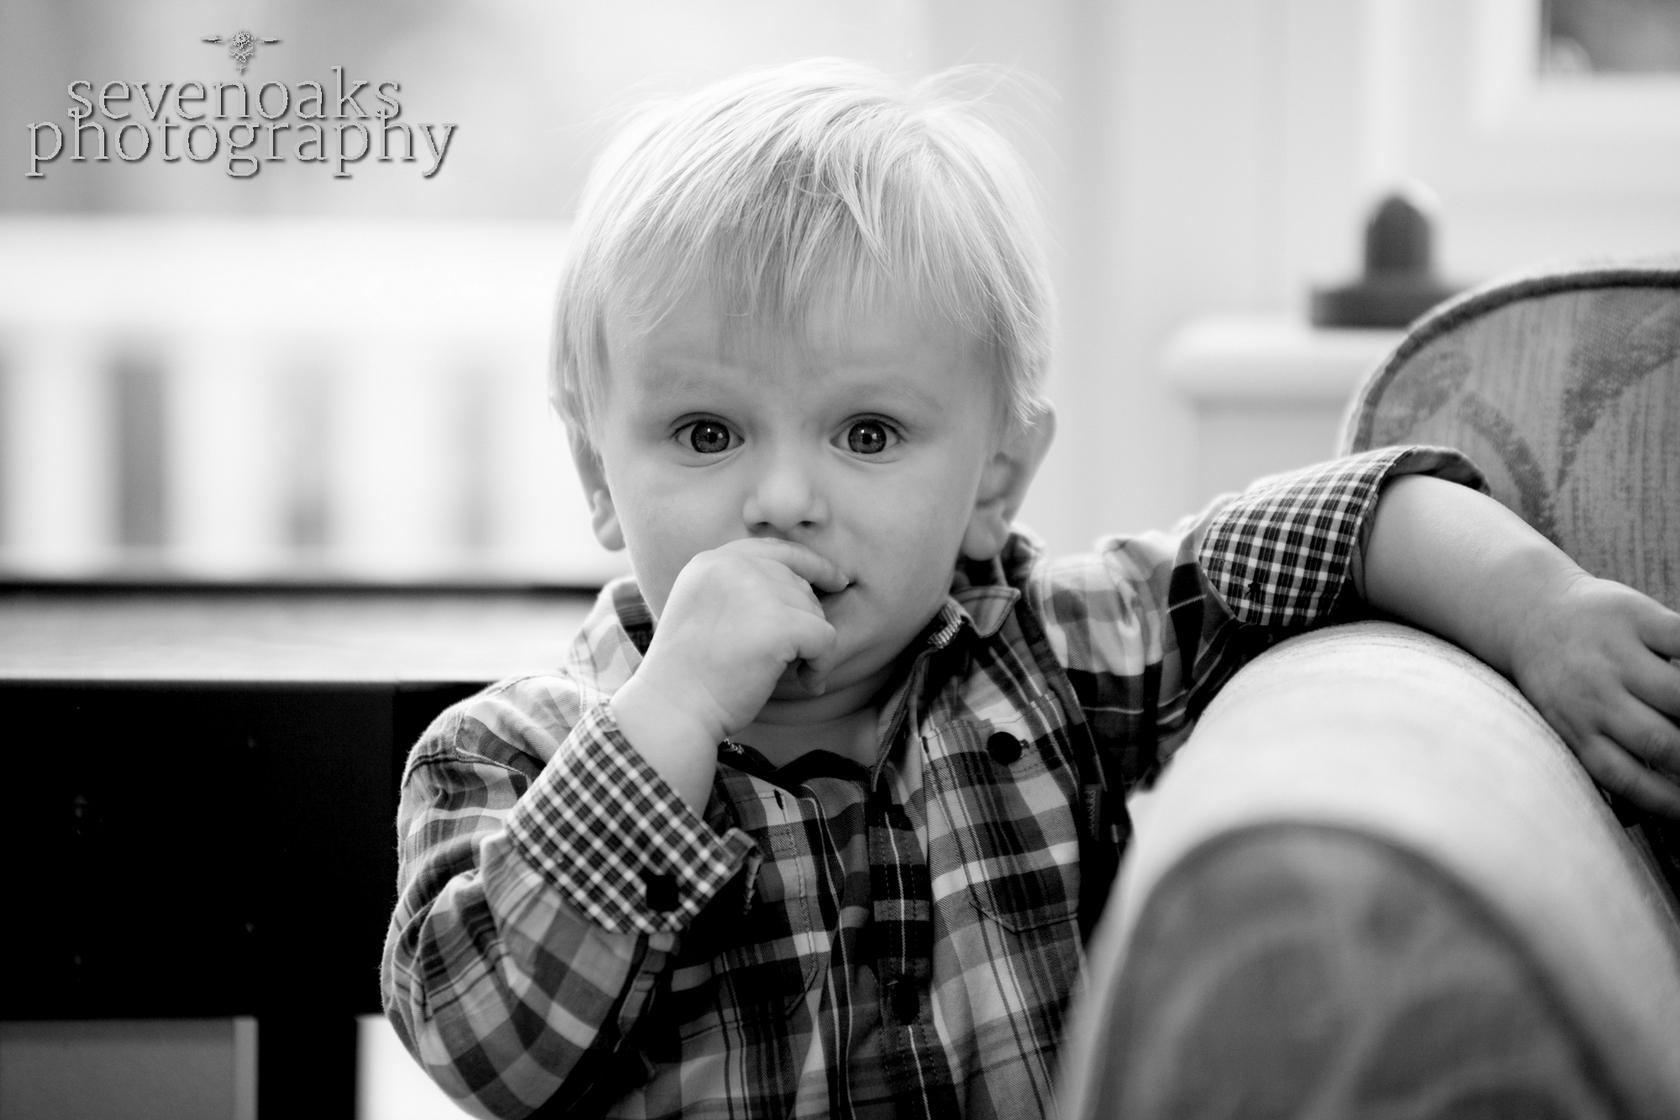 sevenoaks portrait photographer-16.jpg